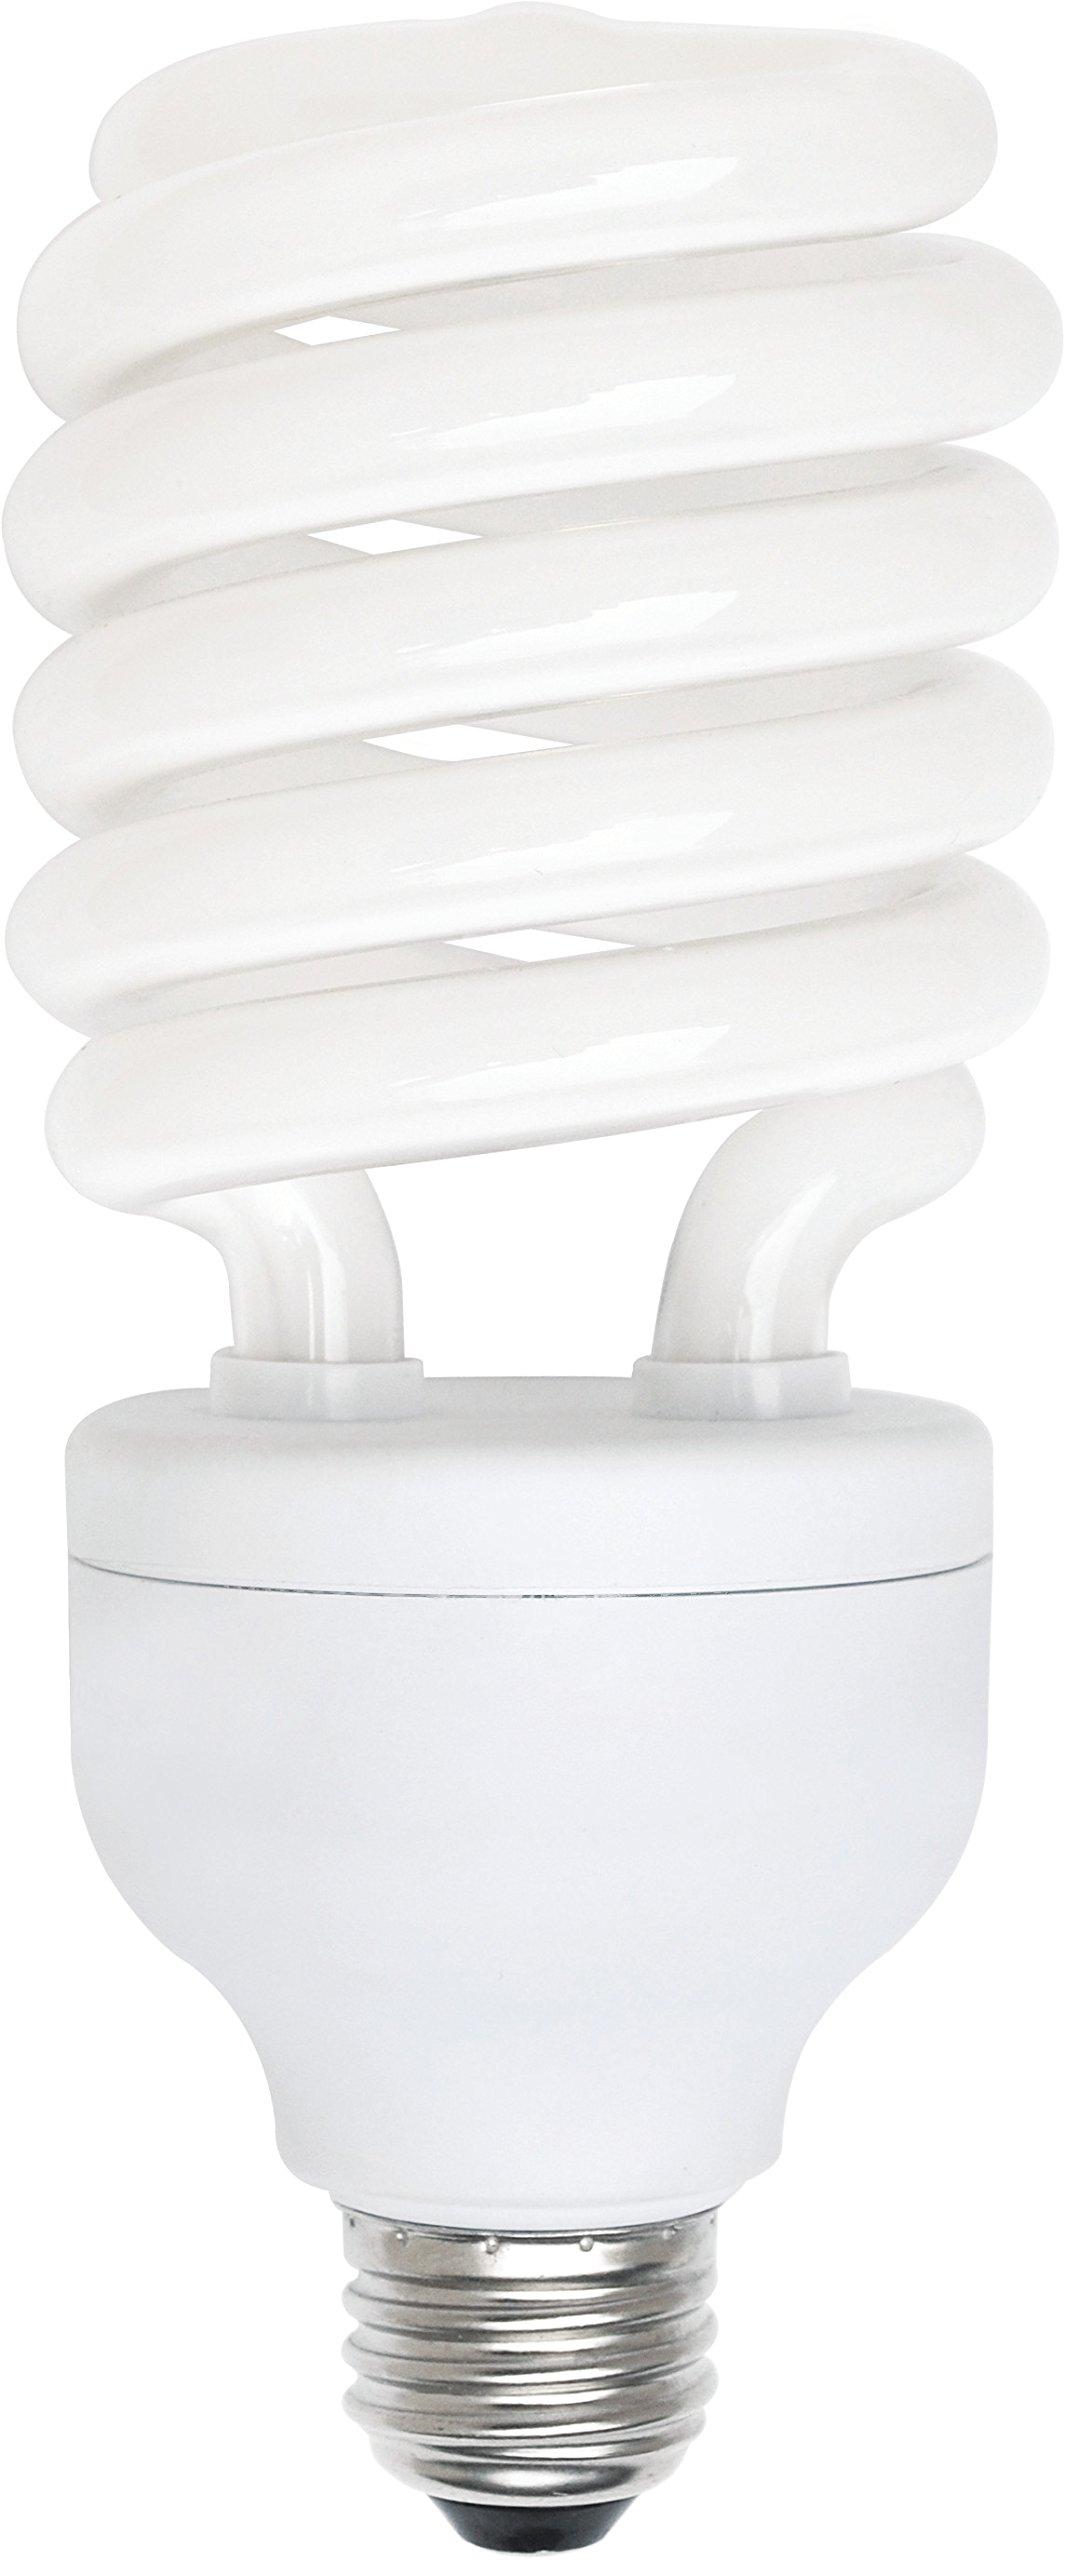 Luxrite LR20210 (10-Pack) 42-Watt CFL T3 Spiral Light Bulb, Equivalent To 200W Incandescent, Warm White 2700K, 2820 Lumens, E26 Standard Base